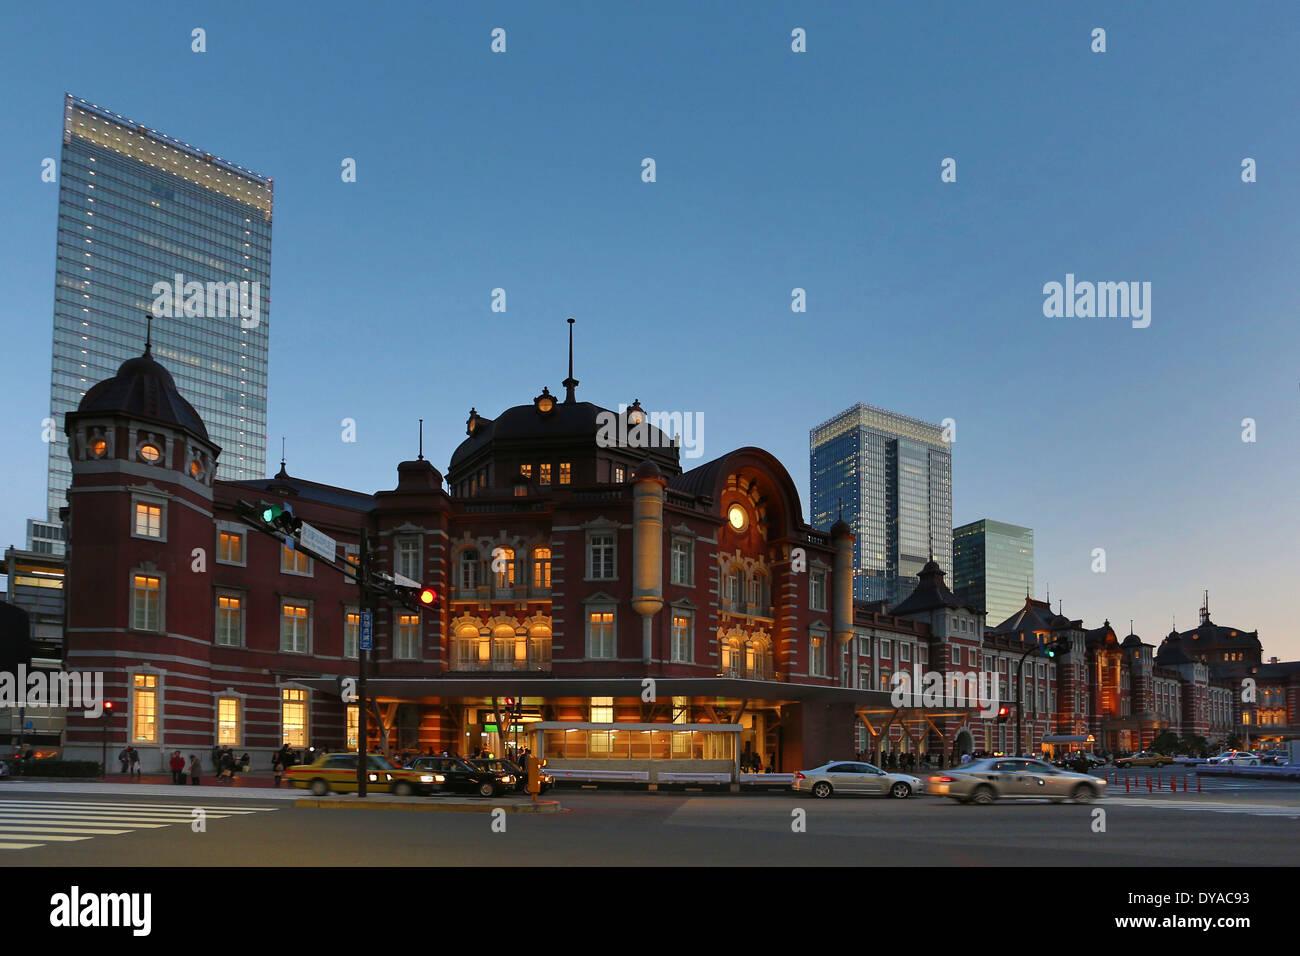 Japan, Asia, Tokyo, North, architecture, ceiling, city, landmark, hall, history, renewed, station, sunset, touristic, travel - Stock Image